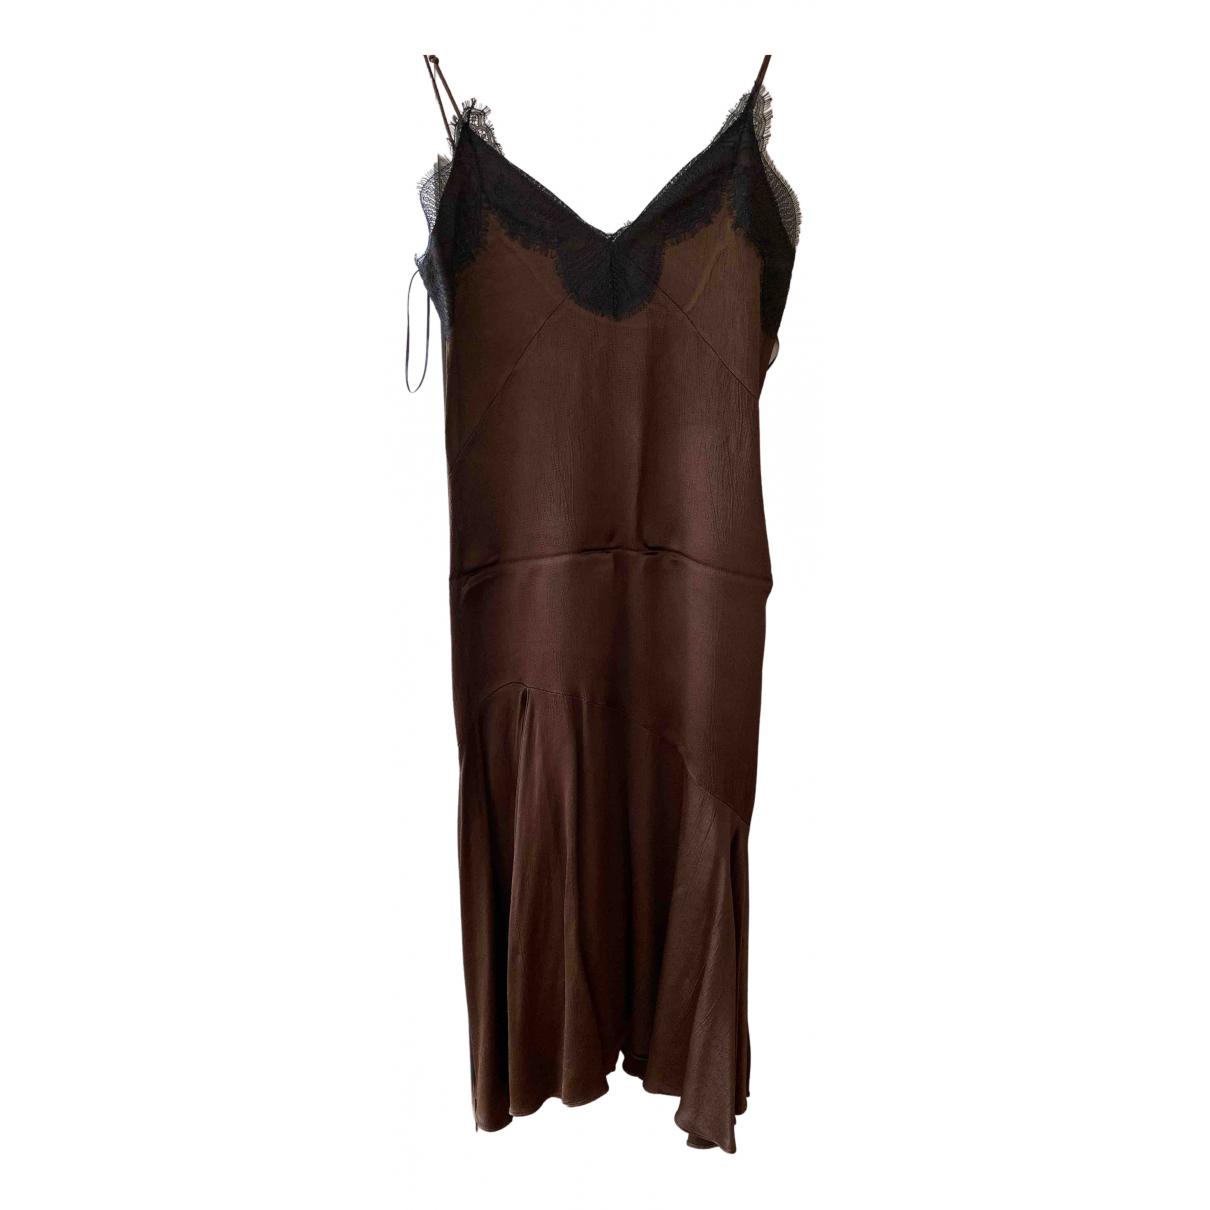 Zara \N Brown dress for Women S International